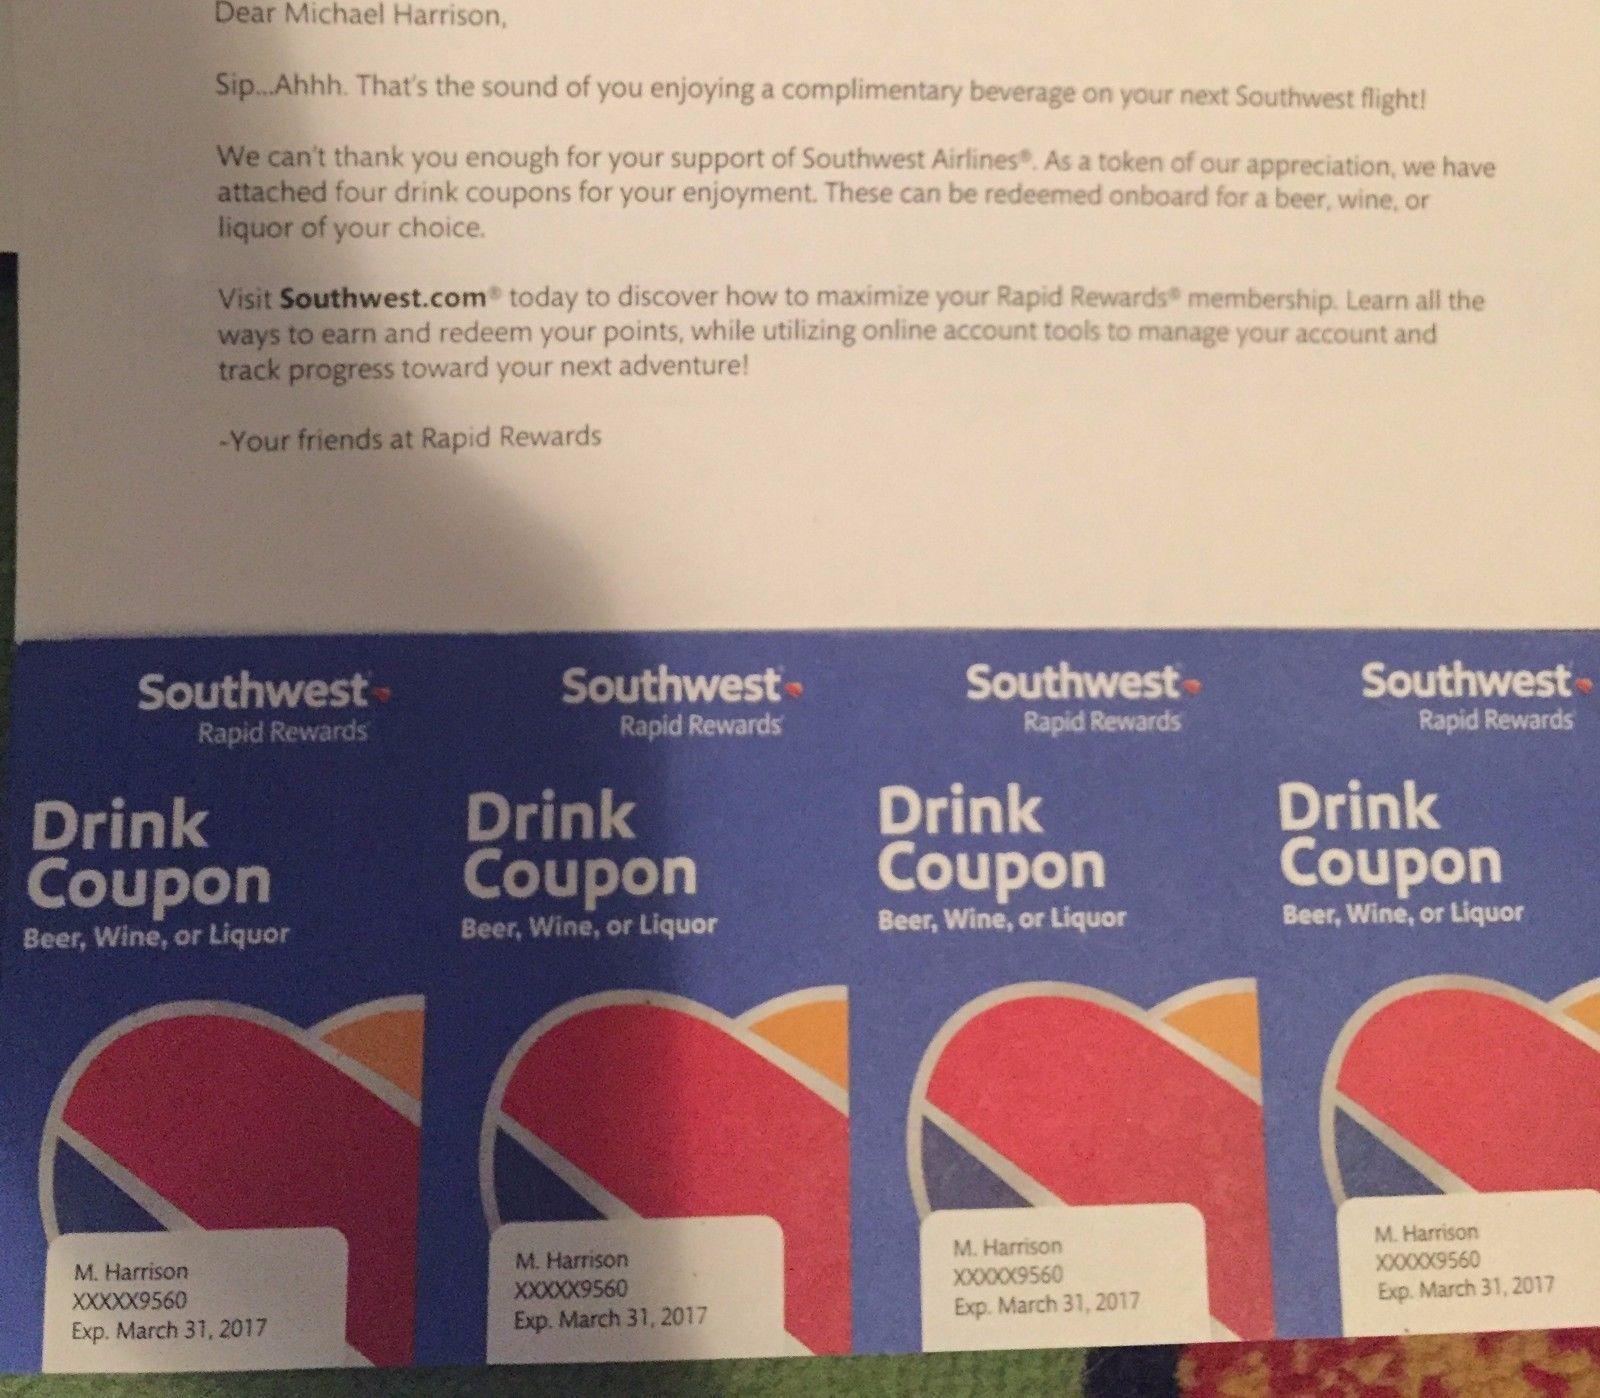 4 Southwest drink coupons https://t.co/otOKx2Mi4Y https://t.co/hF8U8NmpdD